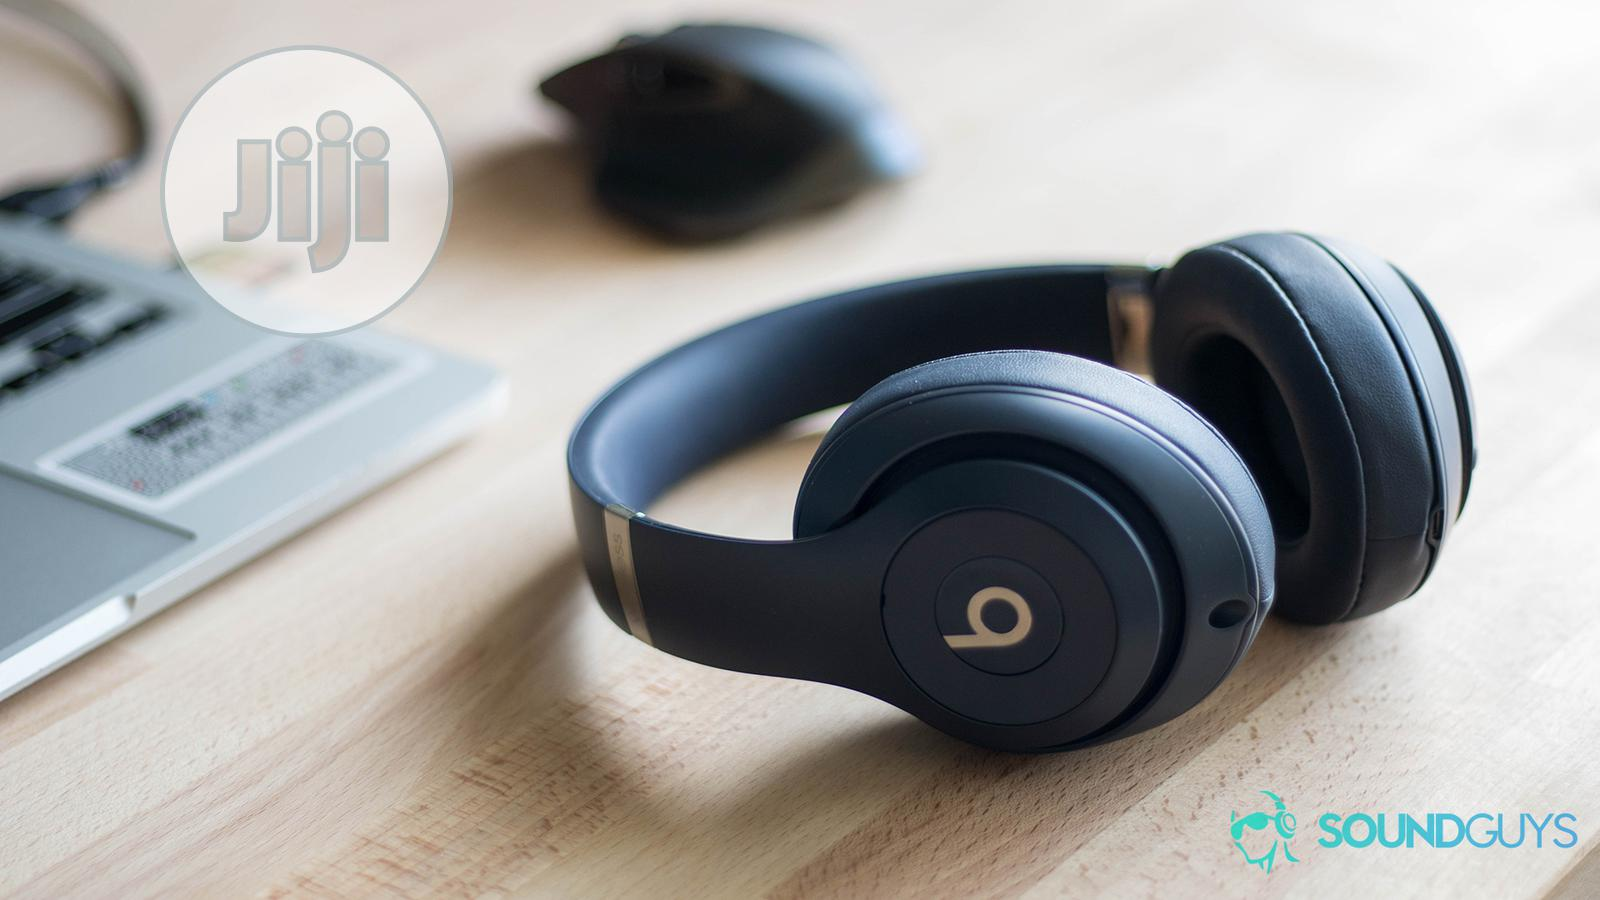 Beats Studio3 Wireless Noise Cancelling Over-ear Headphones   Headphones for sale in Ikeja, Lagos State, Nigeria